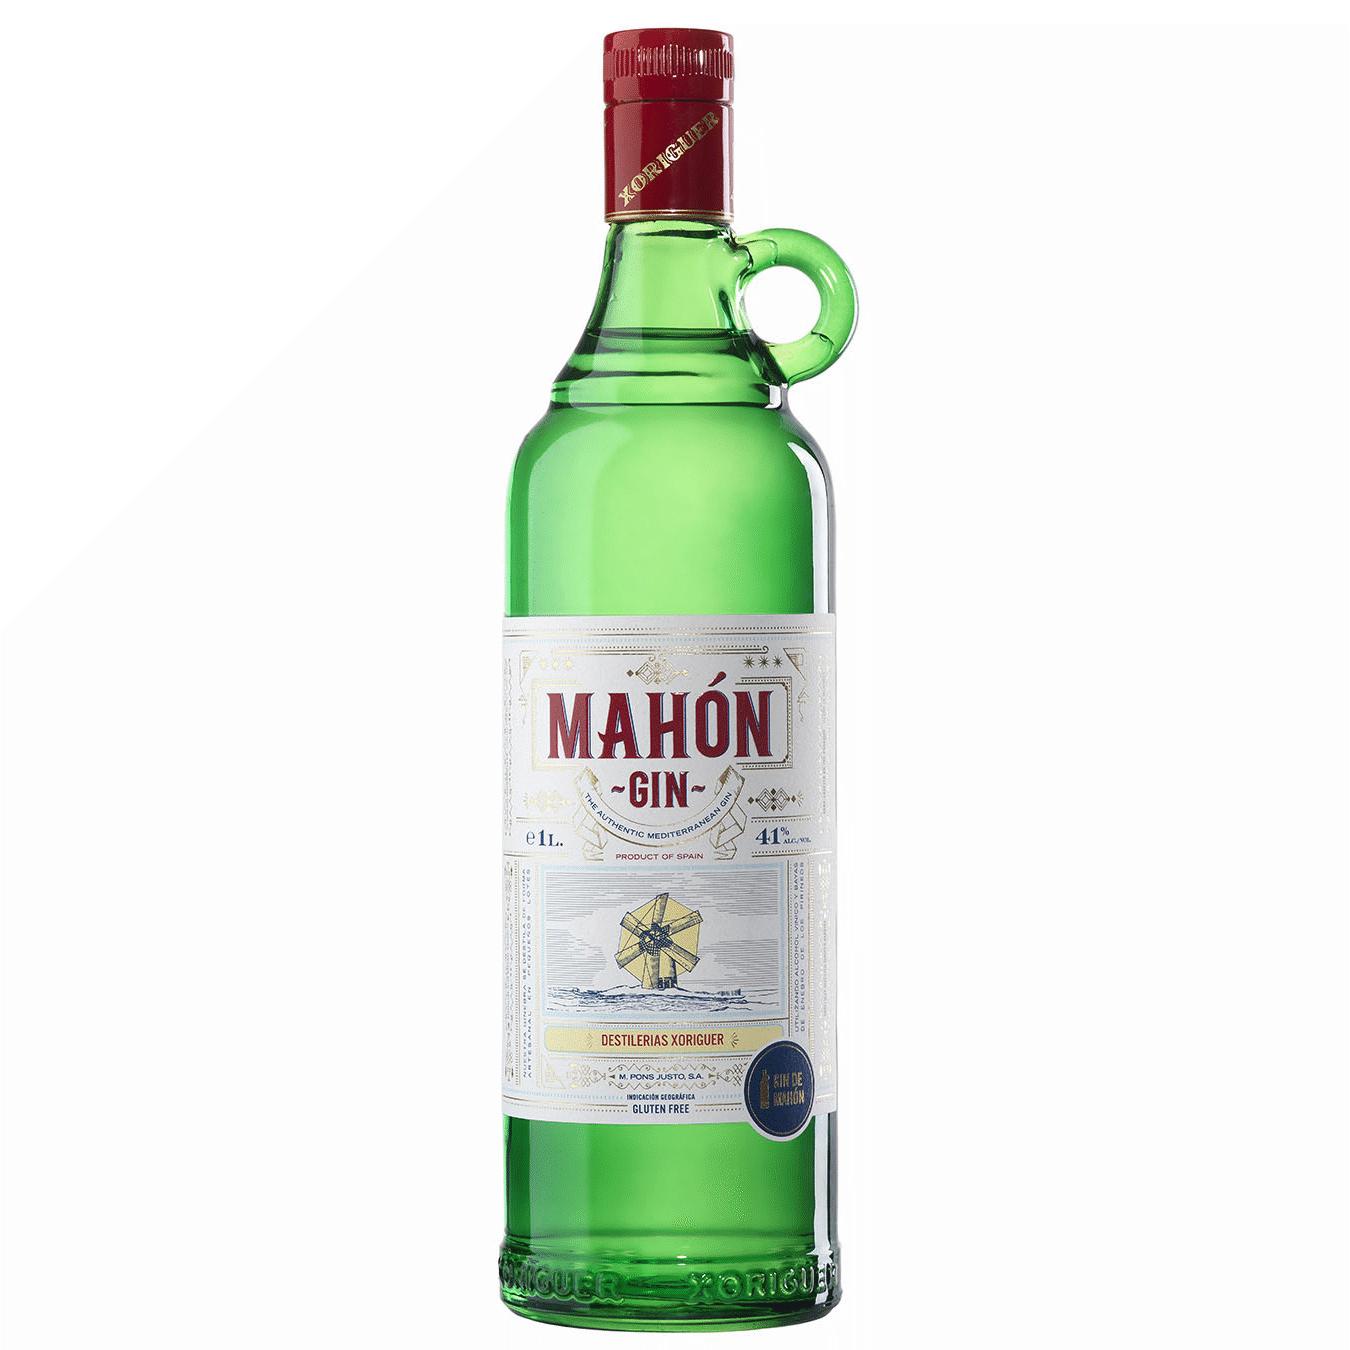 SP_Mahon_Gin_Bottle1L.png